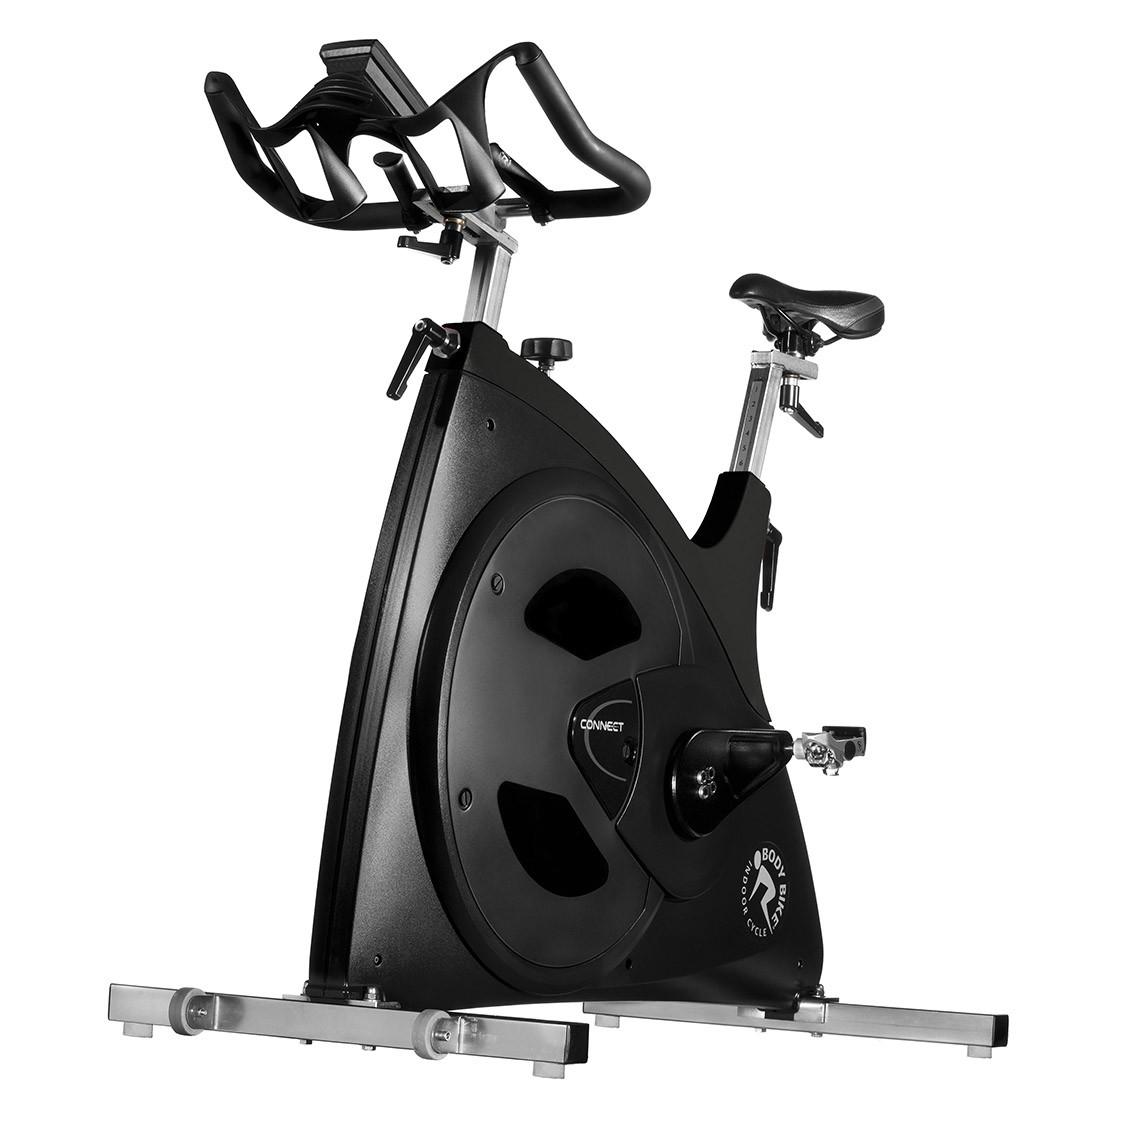 Bicicleta Ciclo Indoor Body Bike Connect Black Night KM0